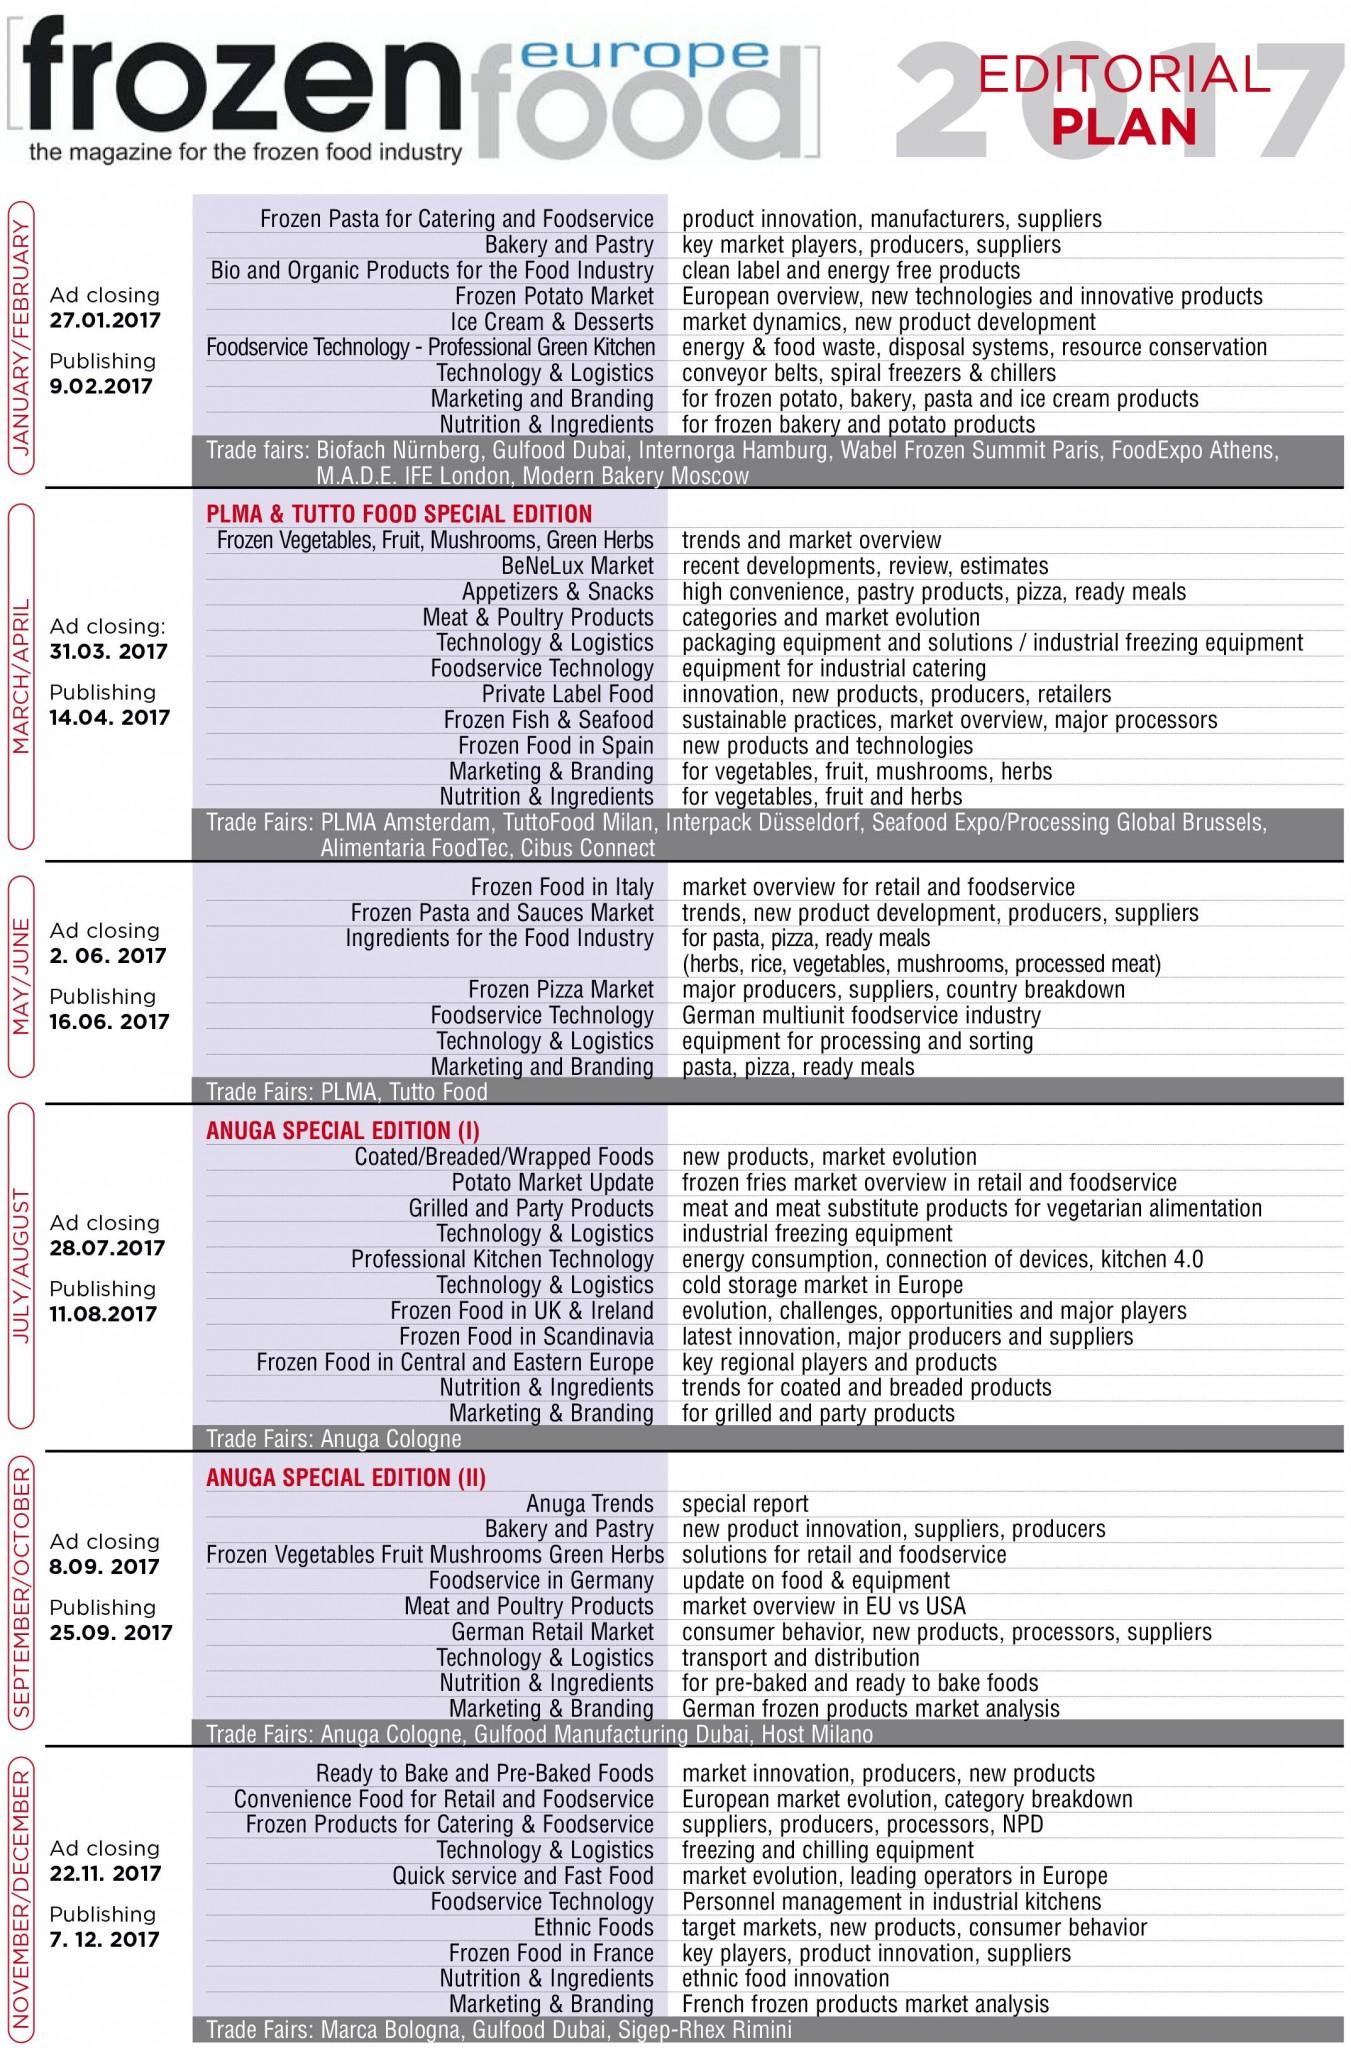 media data 2017_plan editorial 2007.qxd